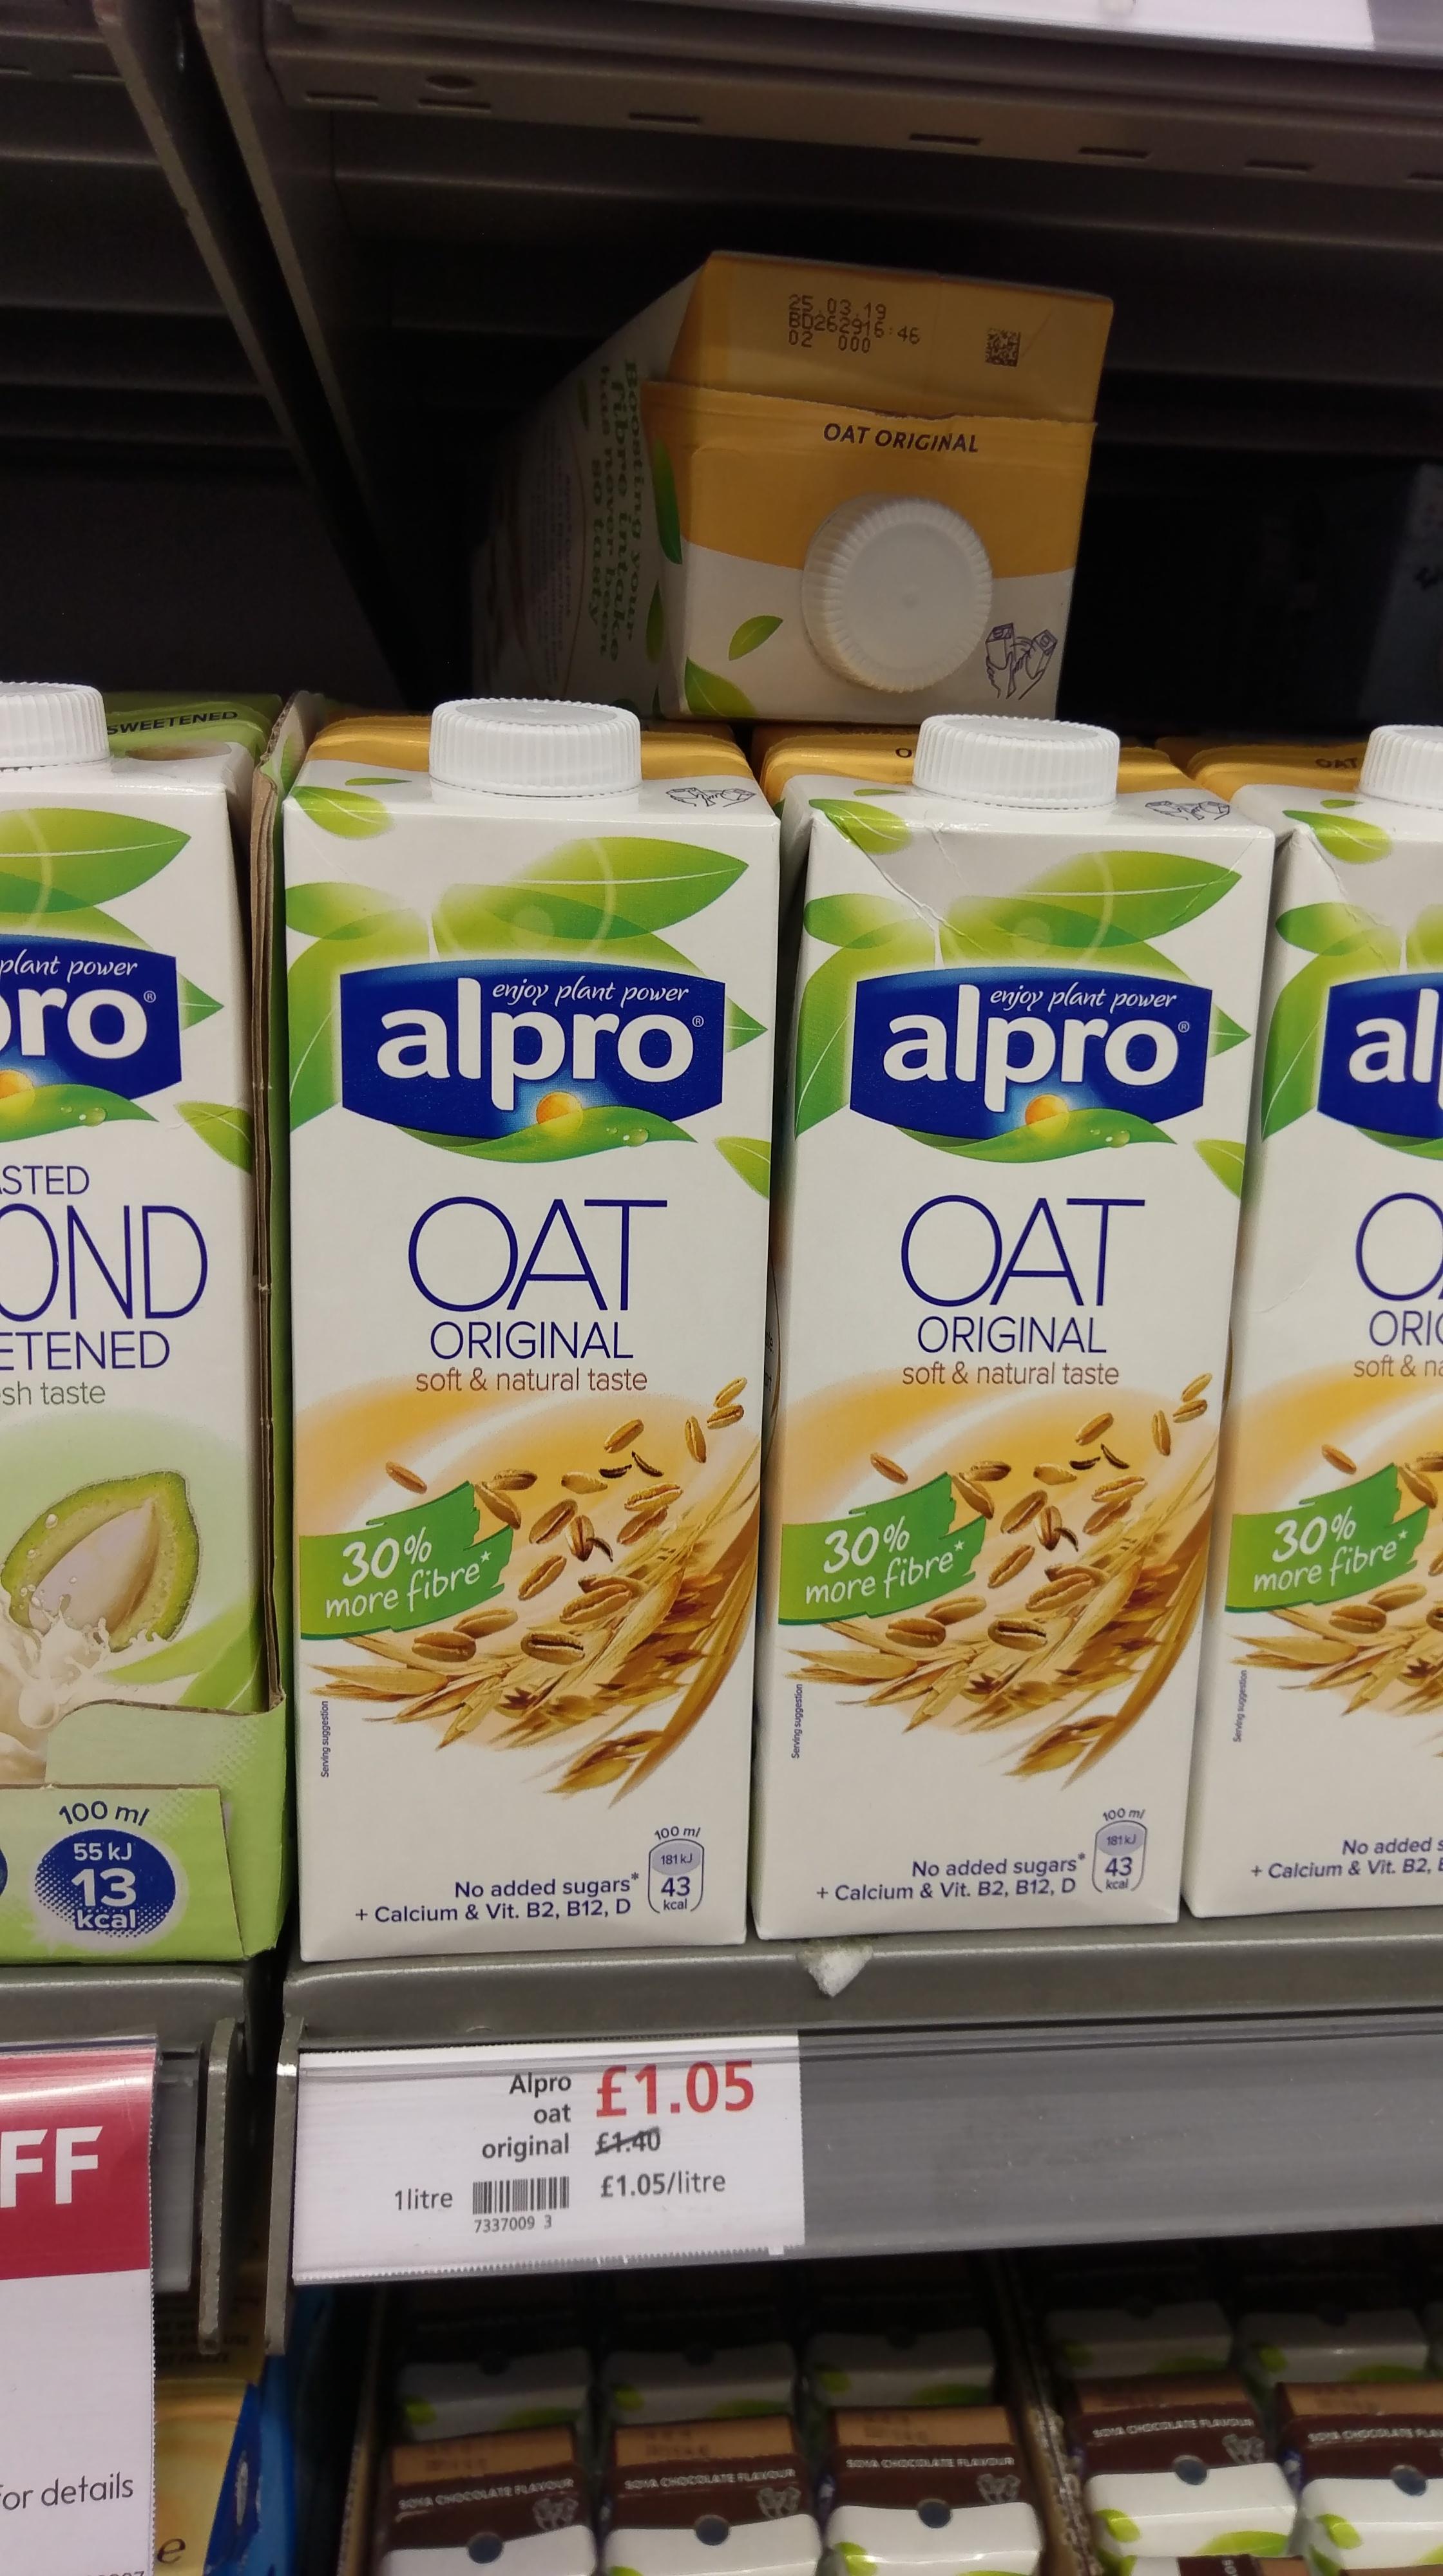 Alpro longlife original oat drink 1litre £1.05 @ Waitrose